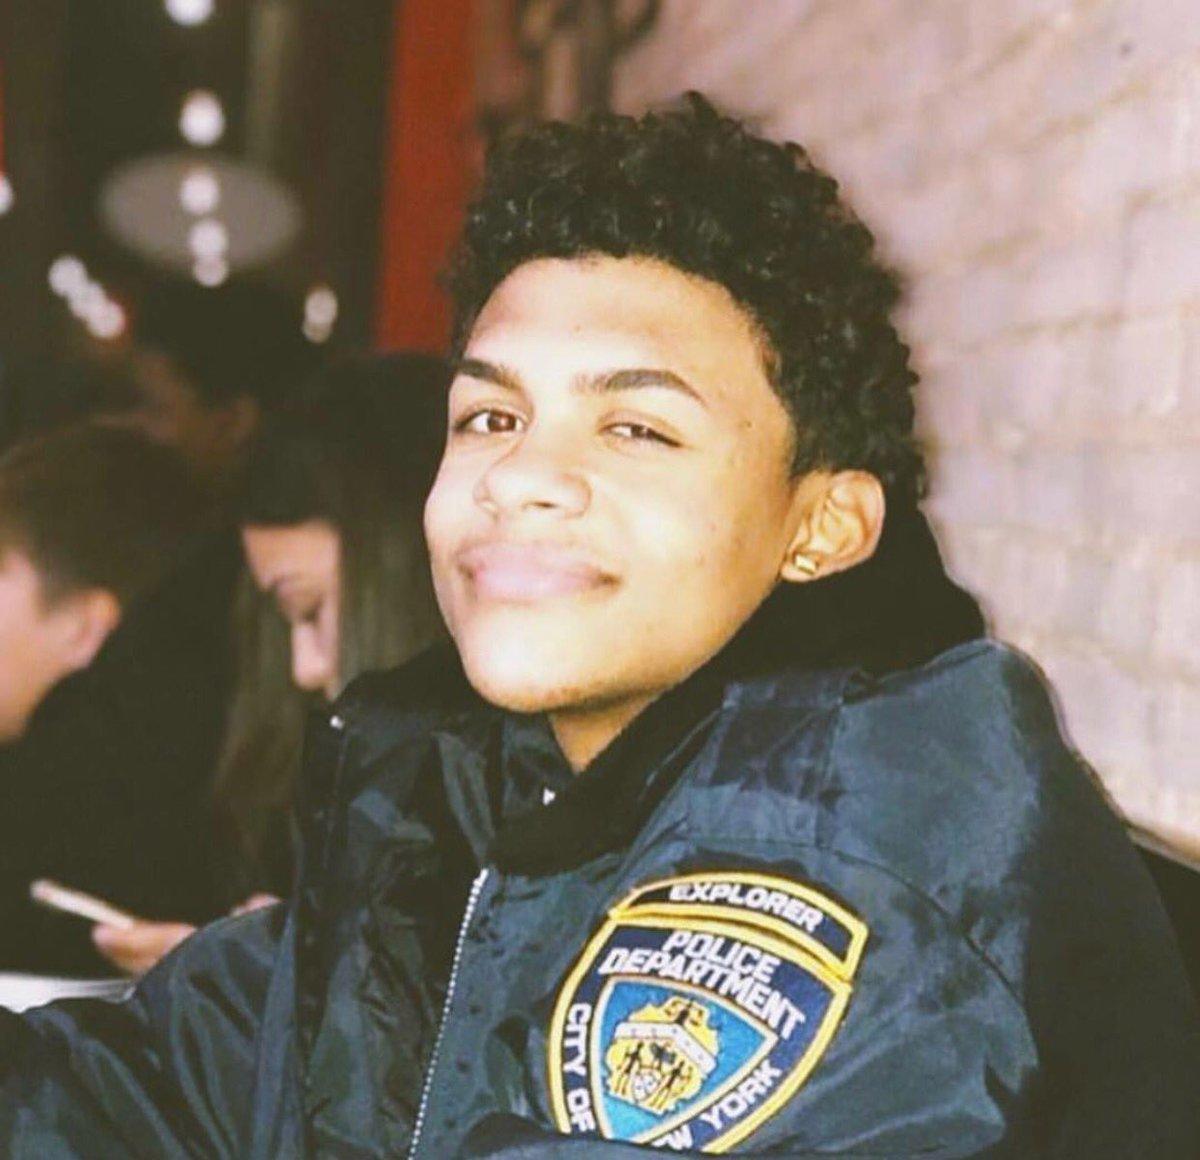 Lesandro Junior Guzman-Feliz 15 was fatally stabbed on a sidewalk in New York City on Wednesday